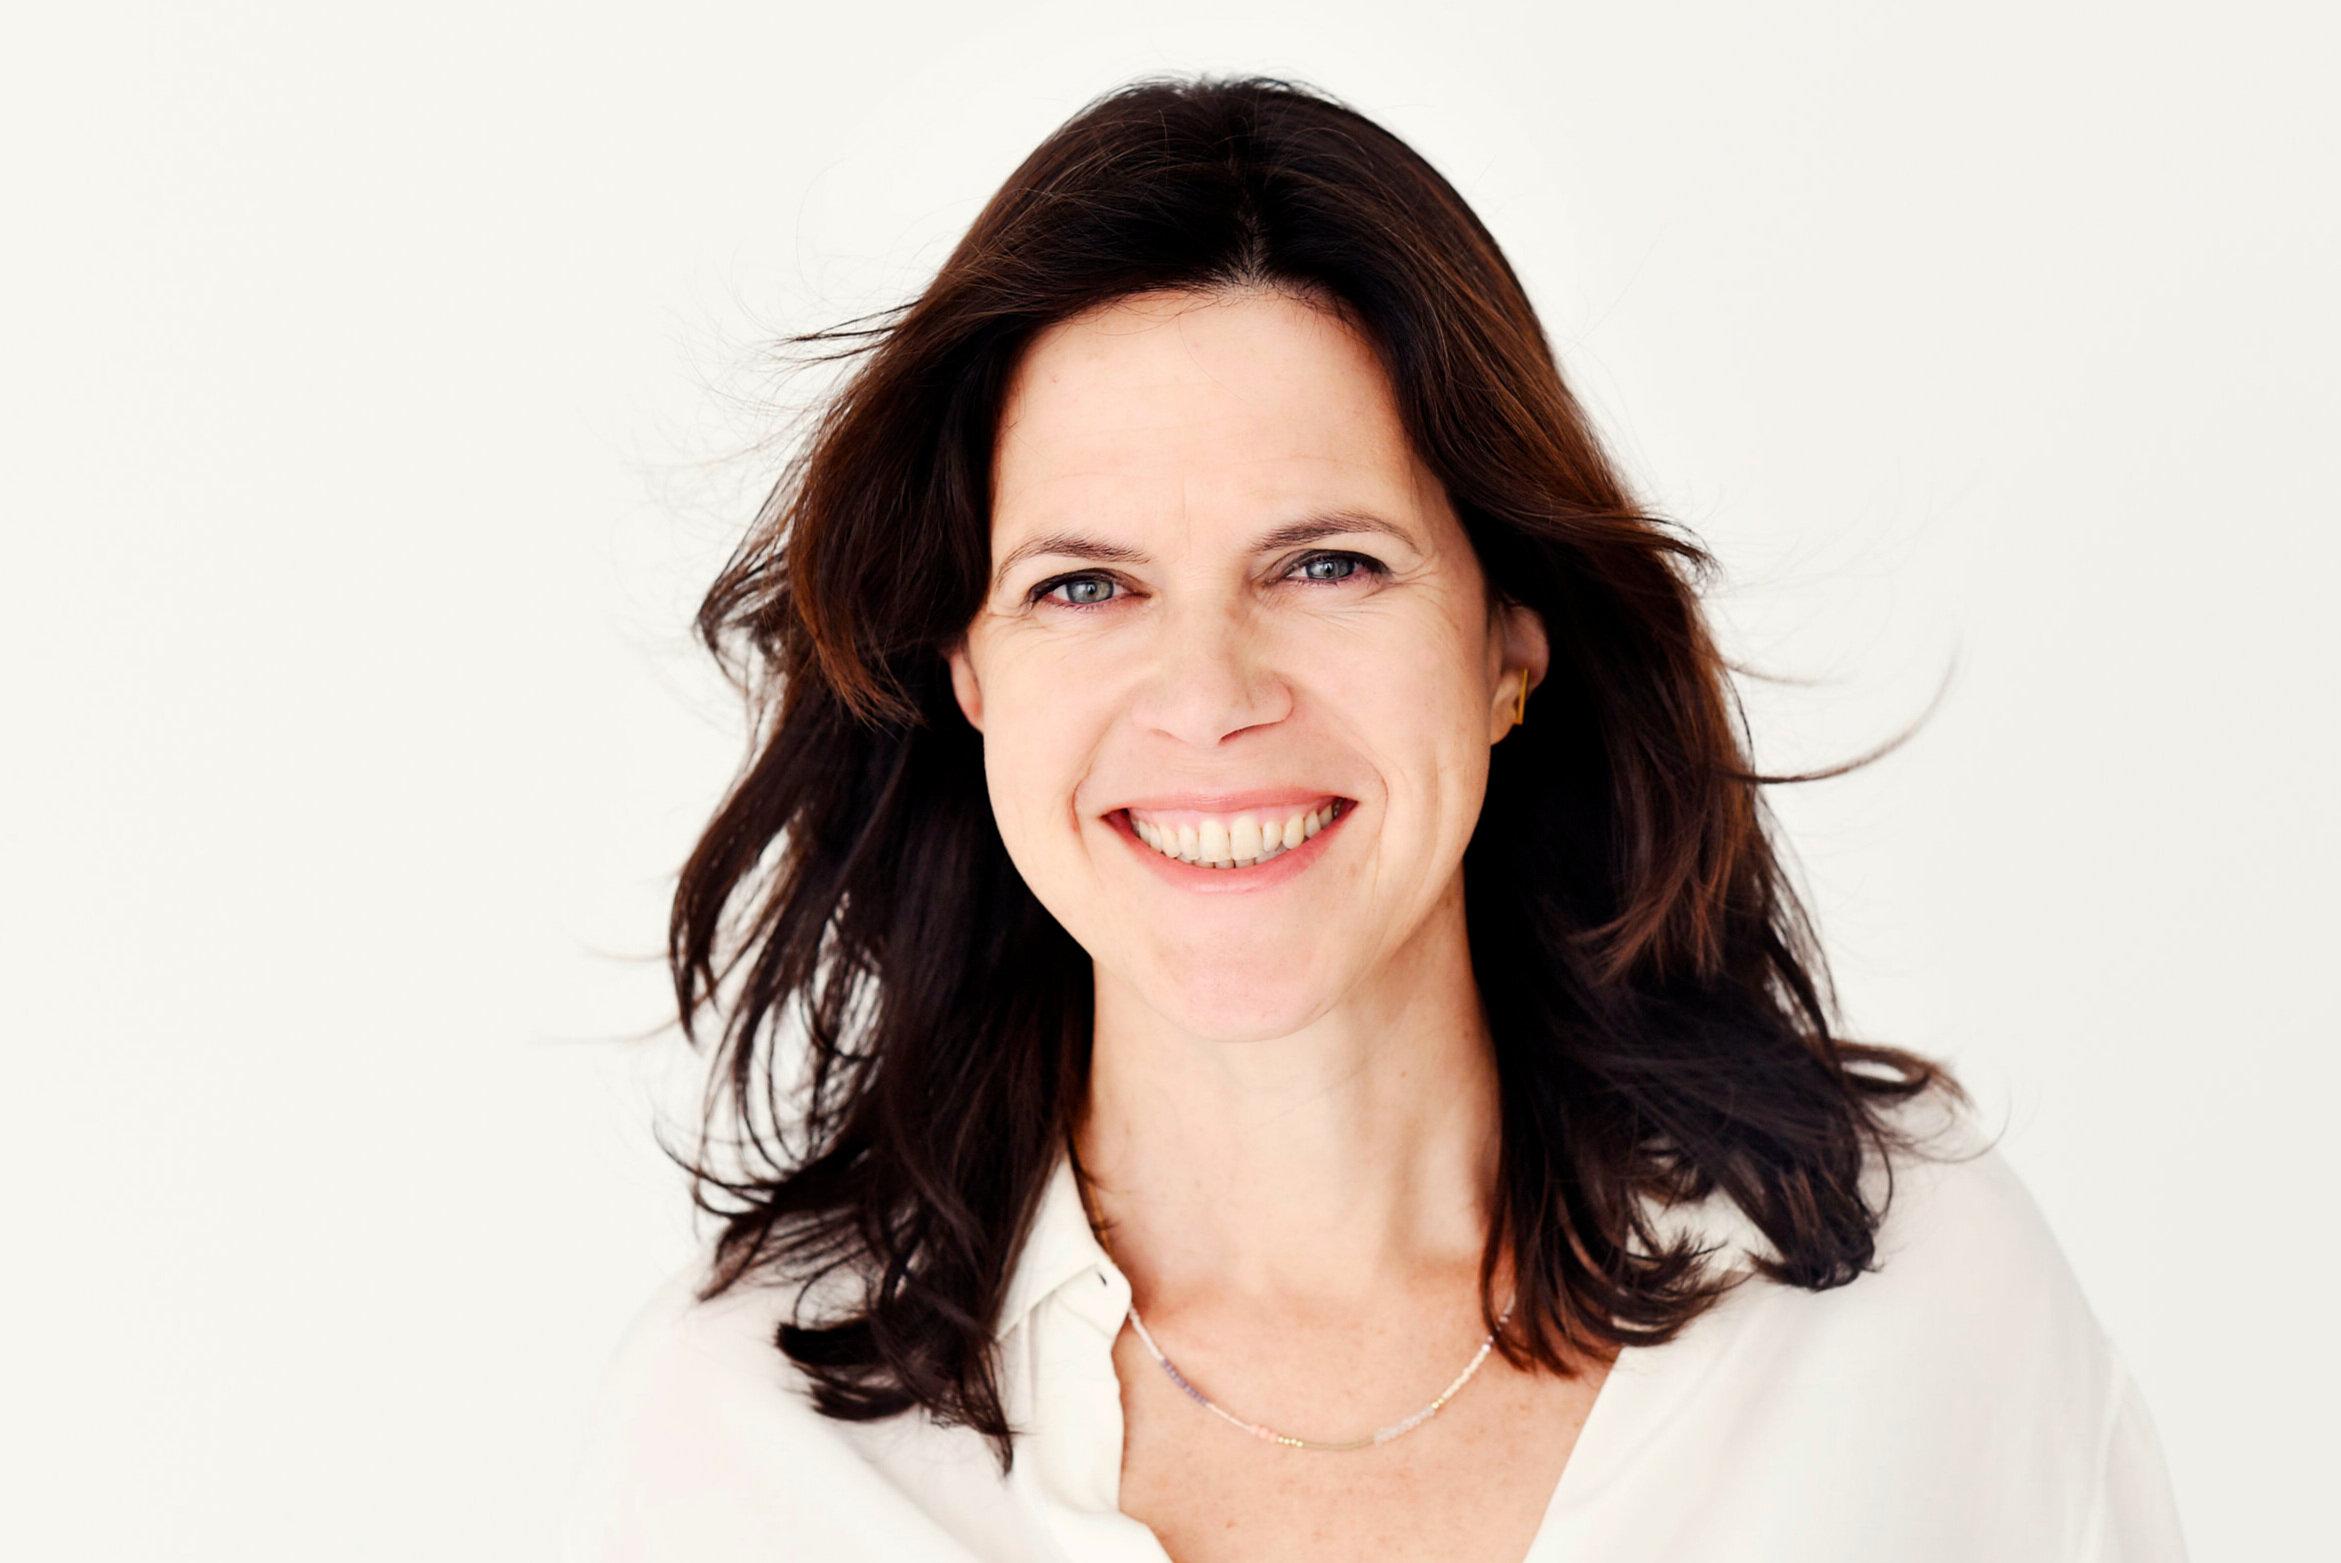 Sasja N. Duijff, PhD - GZ-psycholoog, post-doc onderzoeker, Infant Mental Health specialist DAIMH en Mindfulnesstrainerwww.sasjaduijff.nl